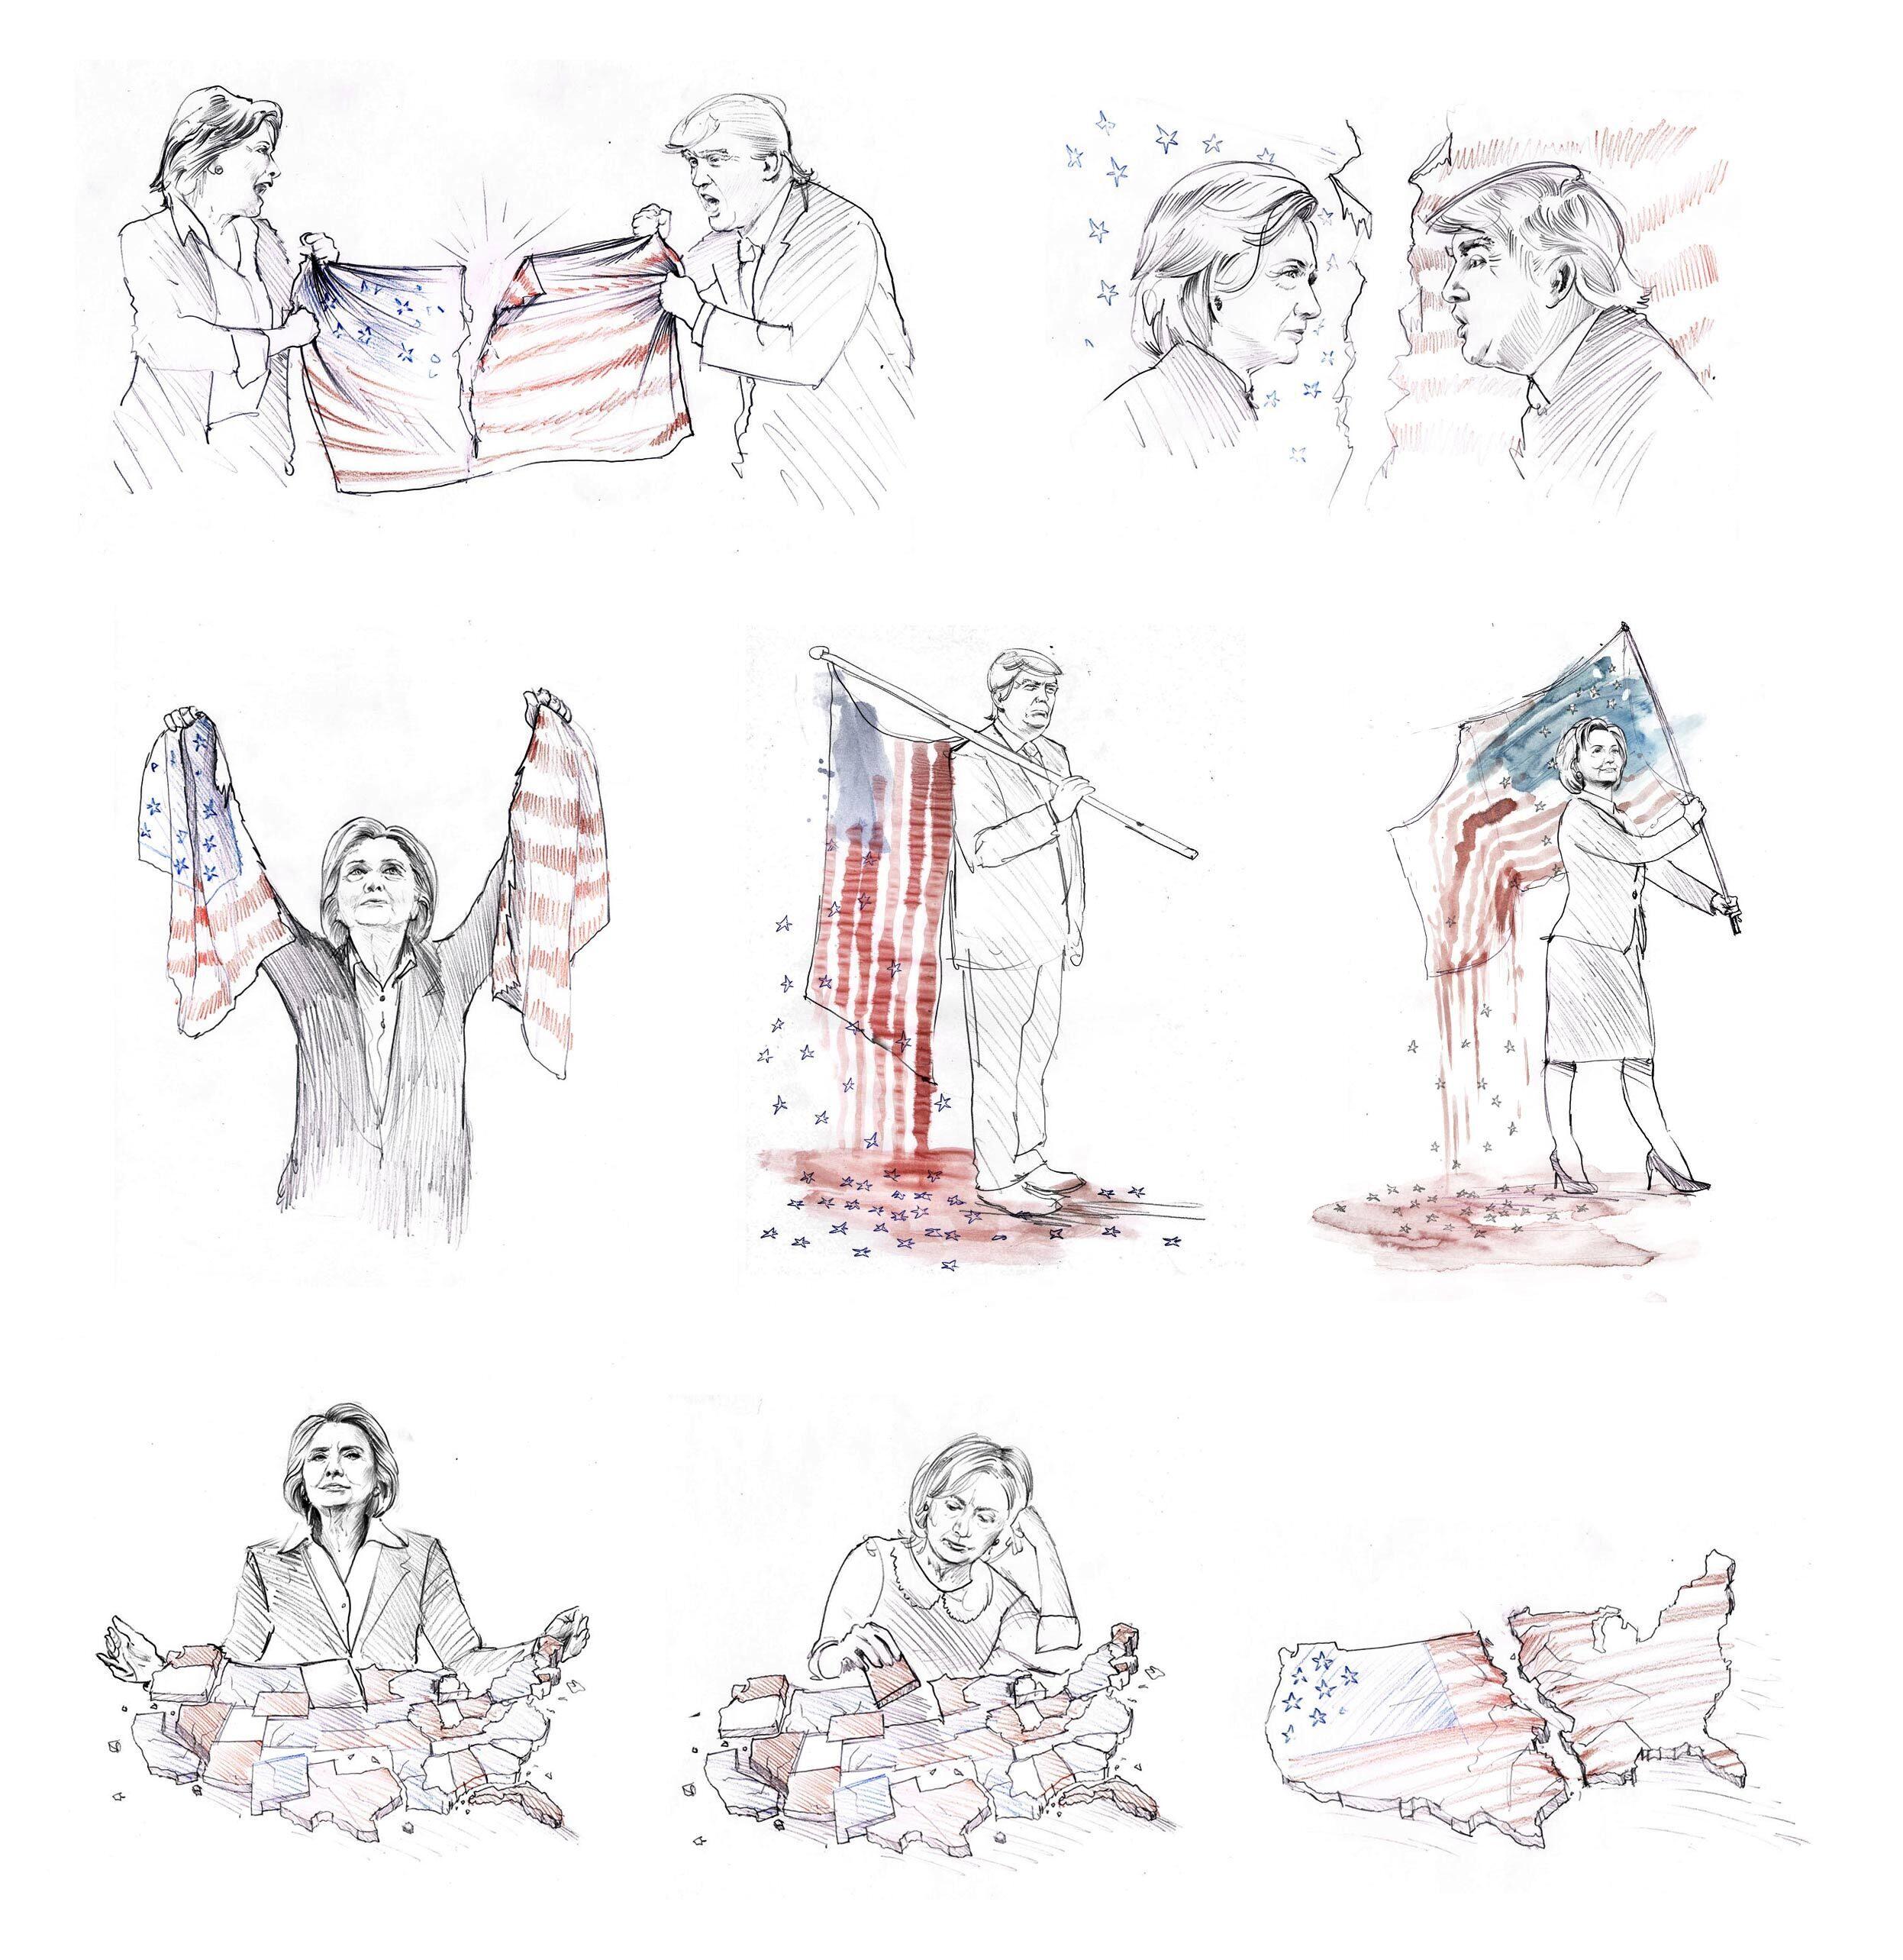 Elections sketches drawing drafts editorial illustration donald trump hilary clinton usa - Kornel Illustration | Kornel Stadler portfolio